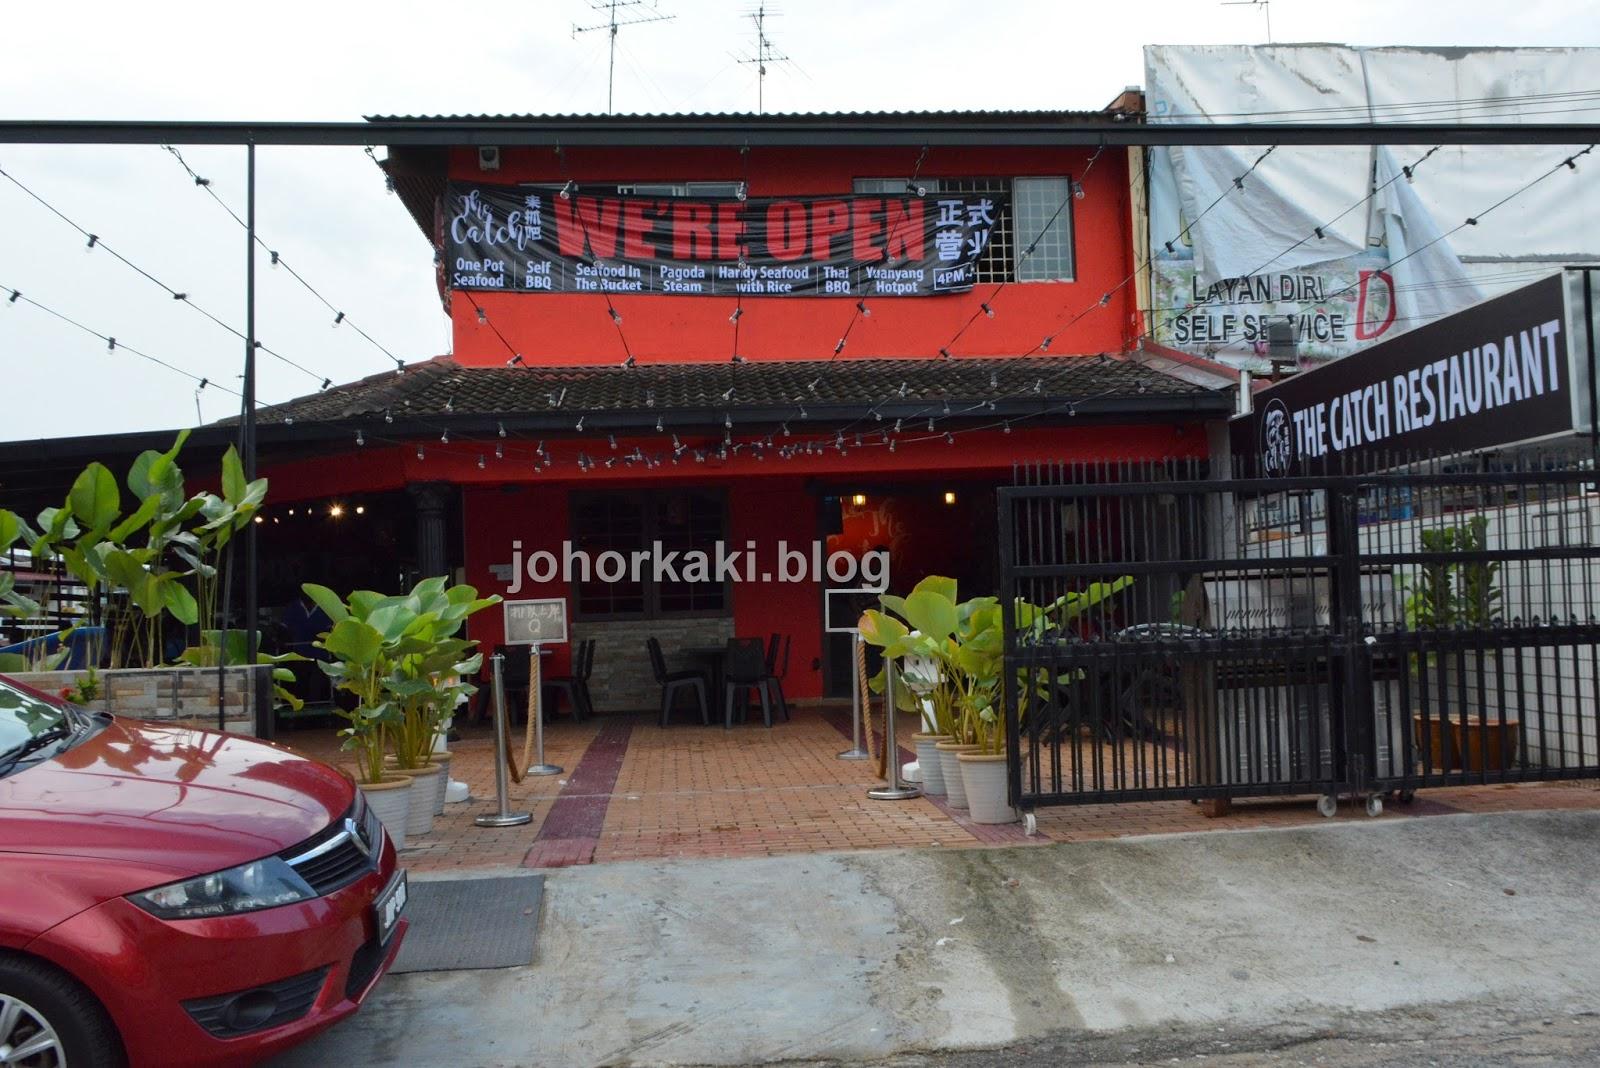 The catch restaurant seafood in johor bahru 手抓吧 jk